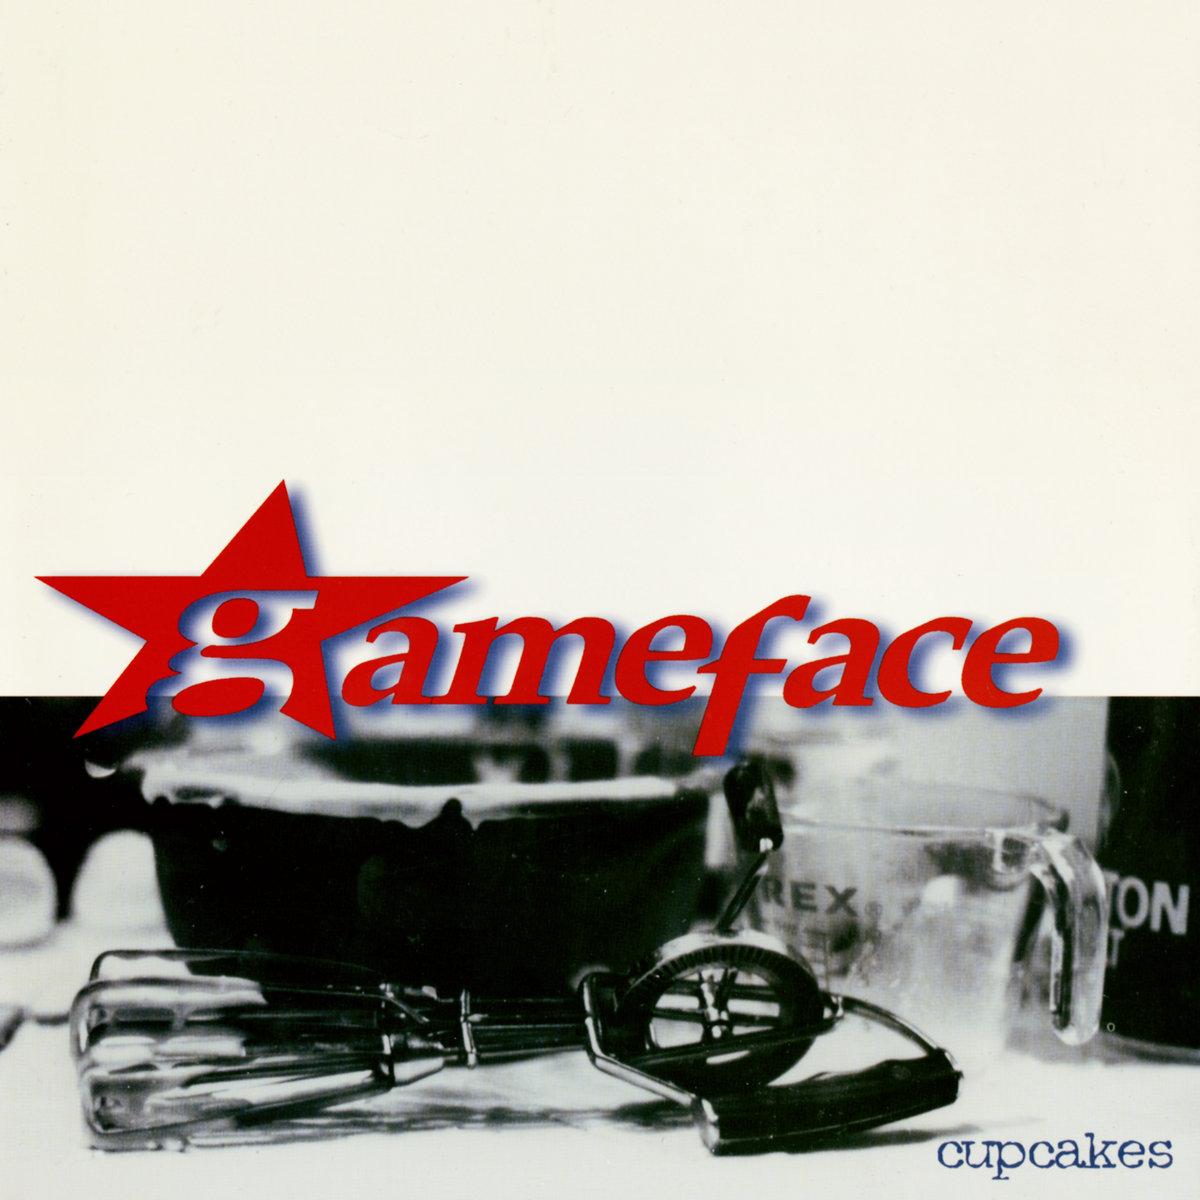 Gameface – Cupcakes (1997) [FLAC]